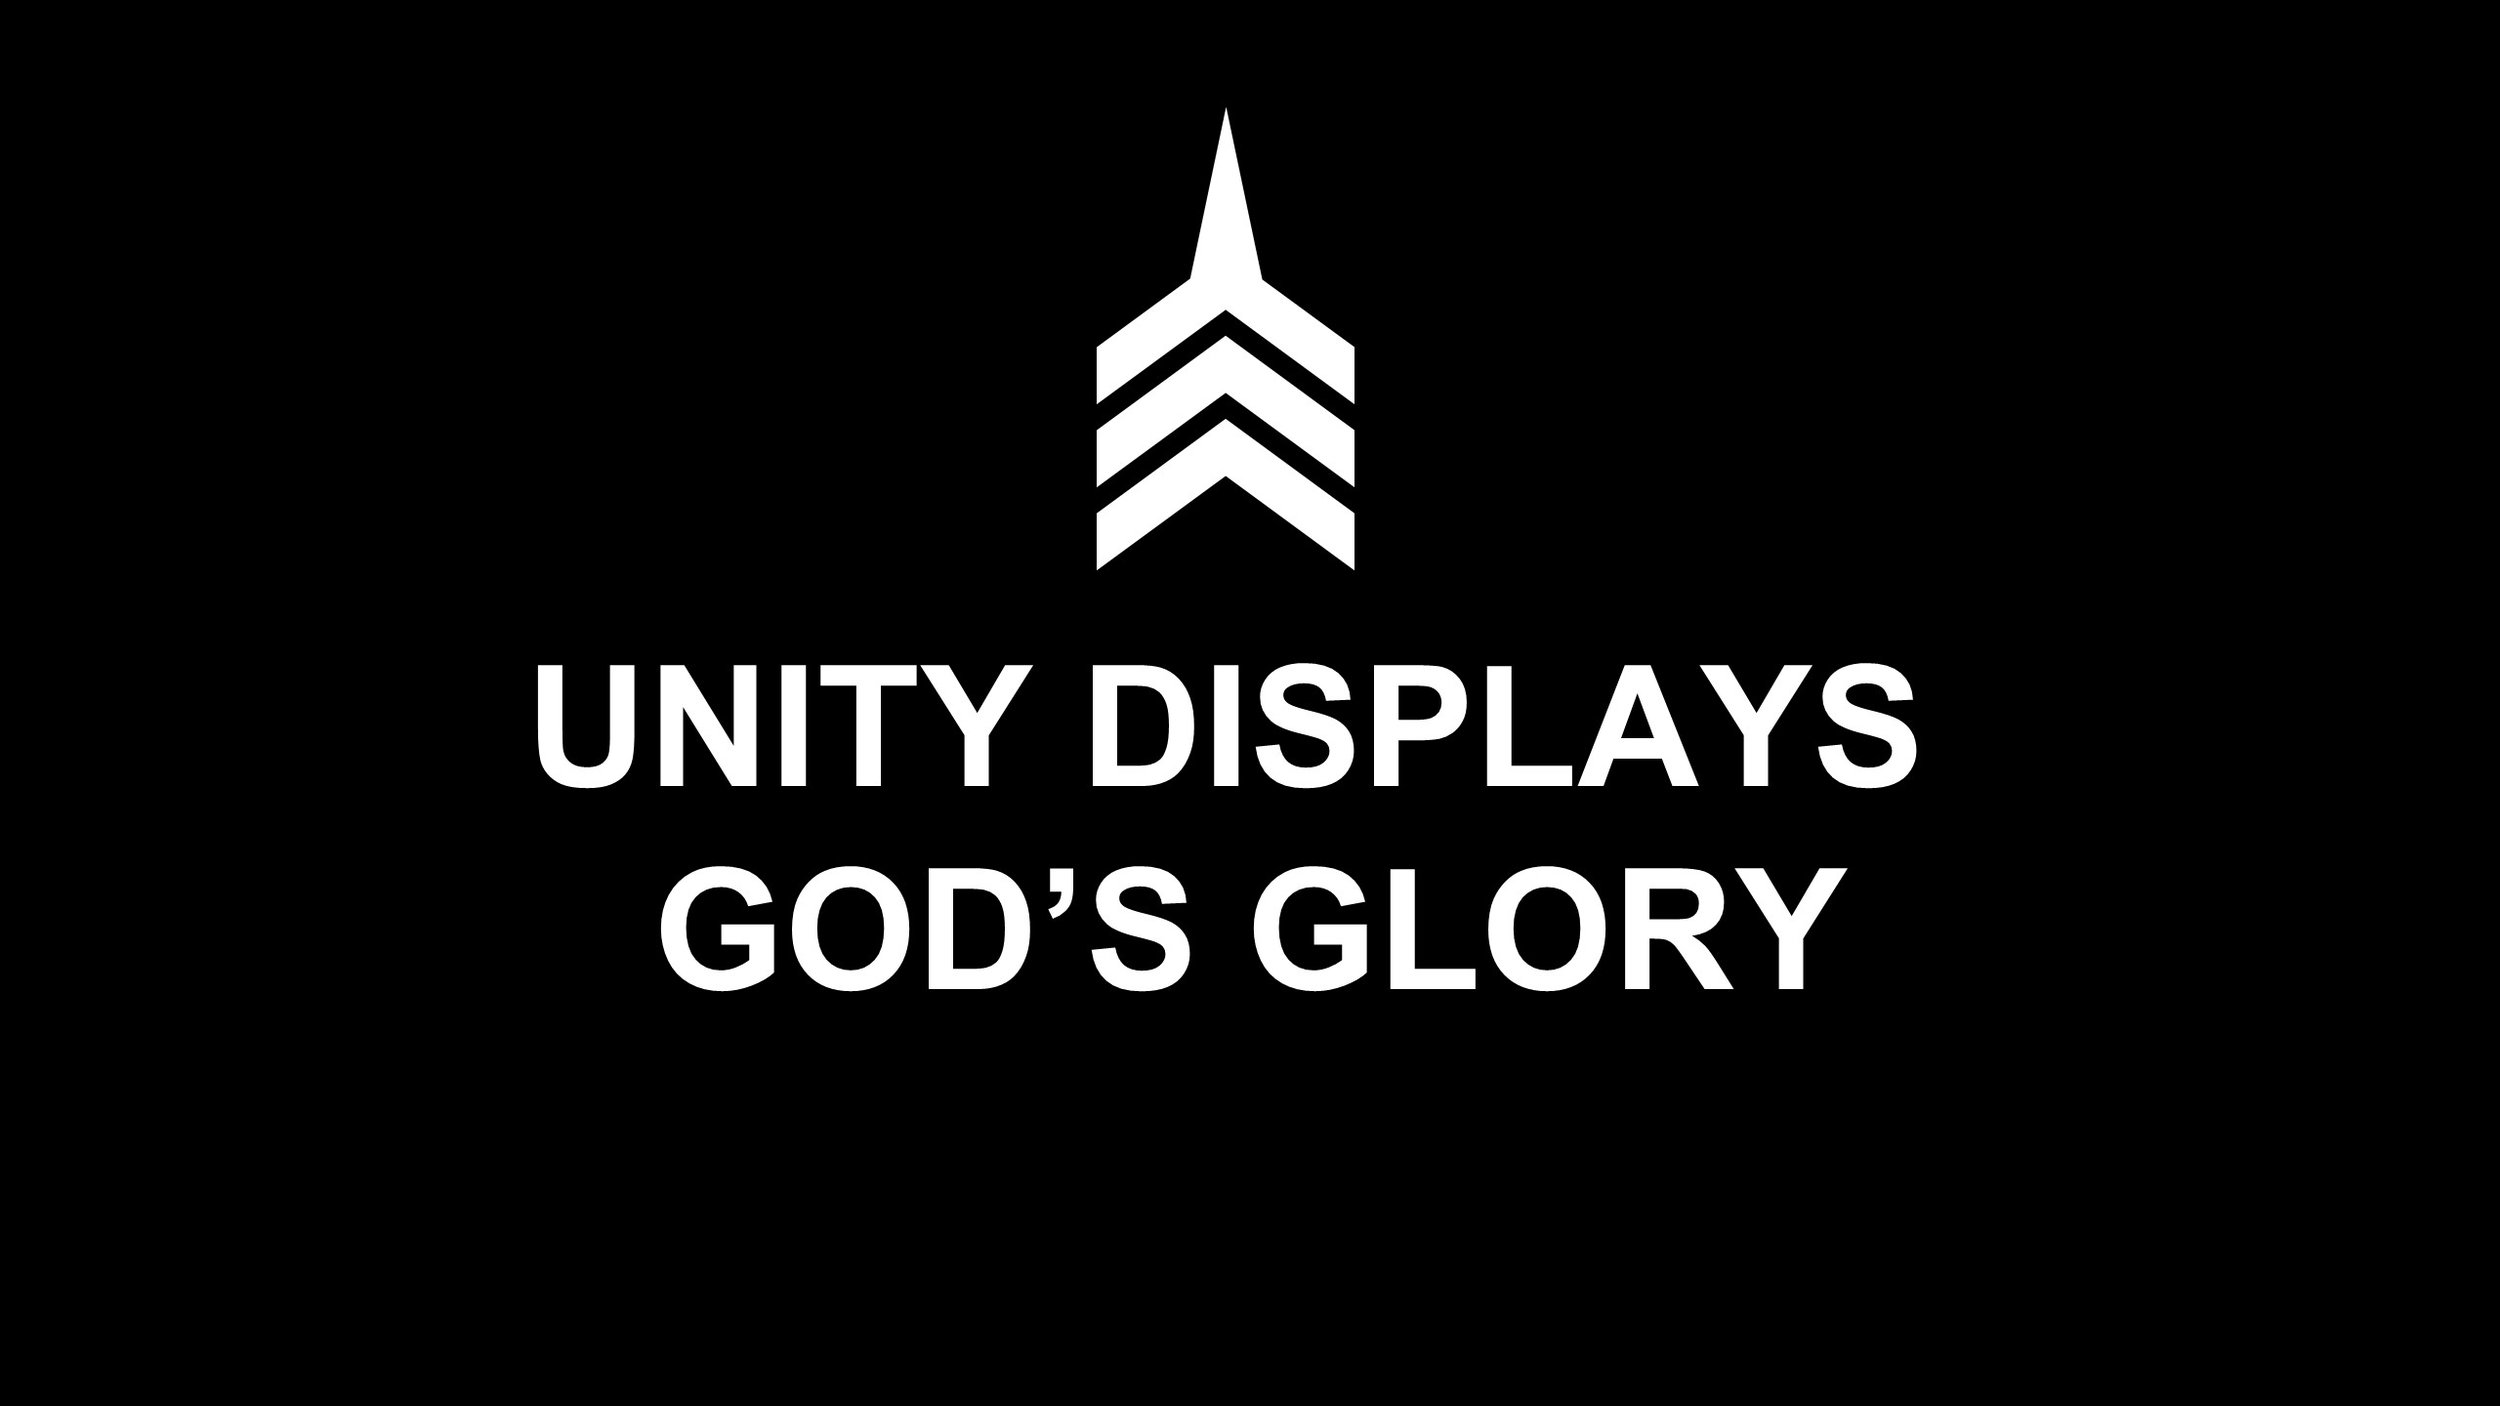 20171105 Unity Displays God's Glory.jpg